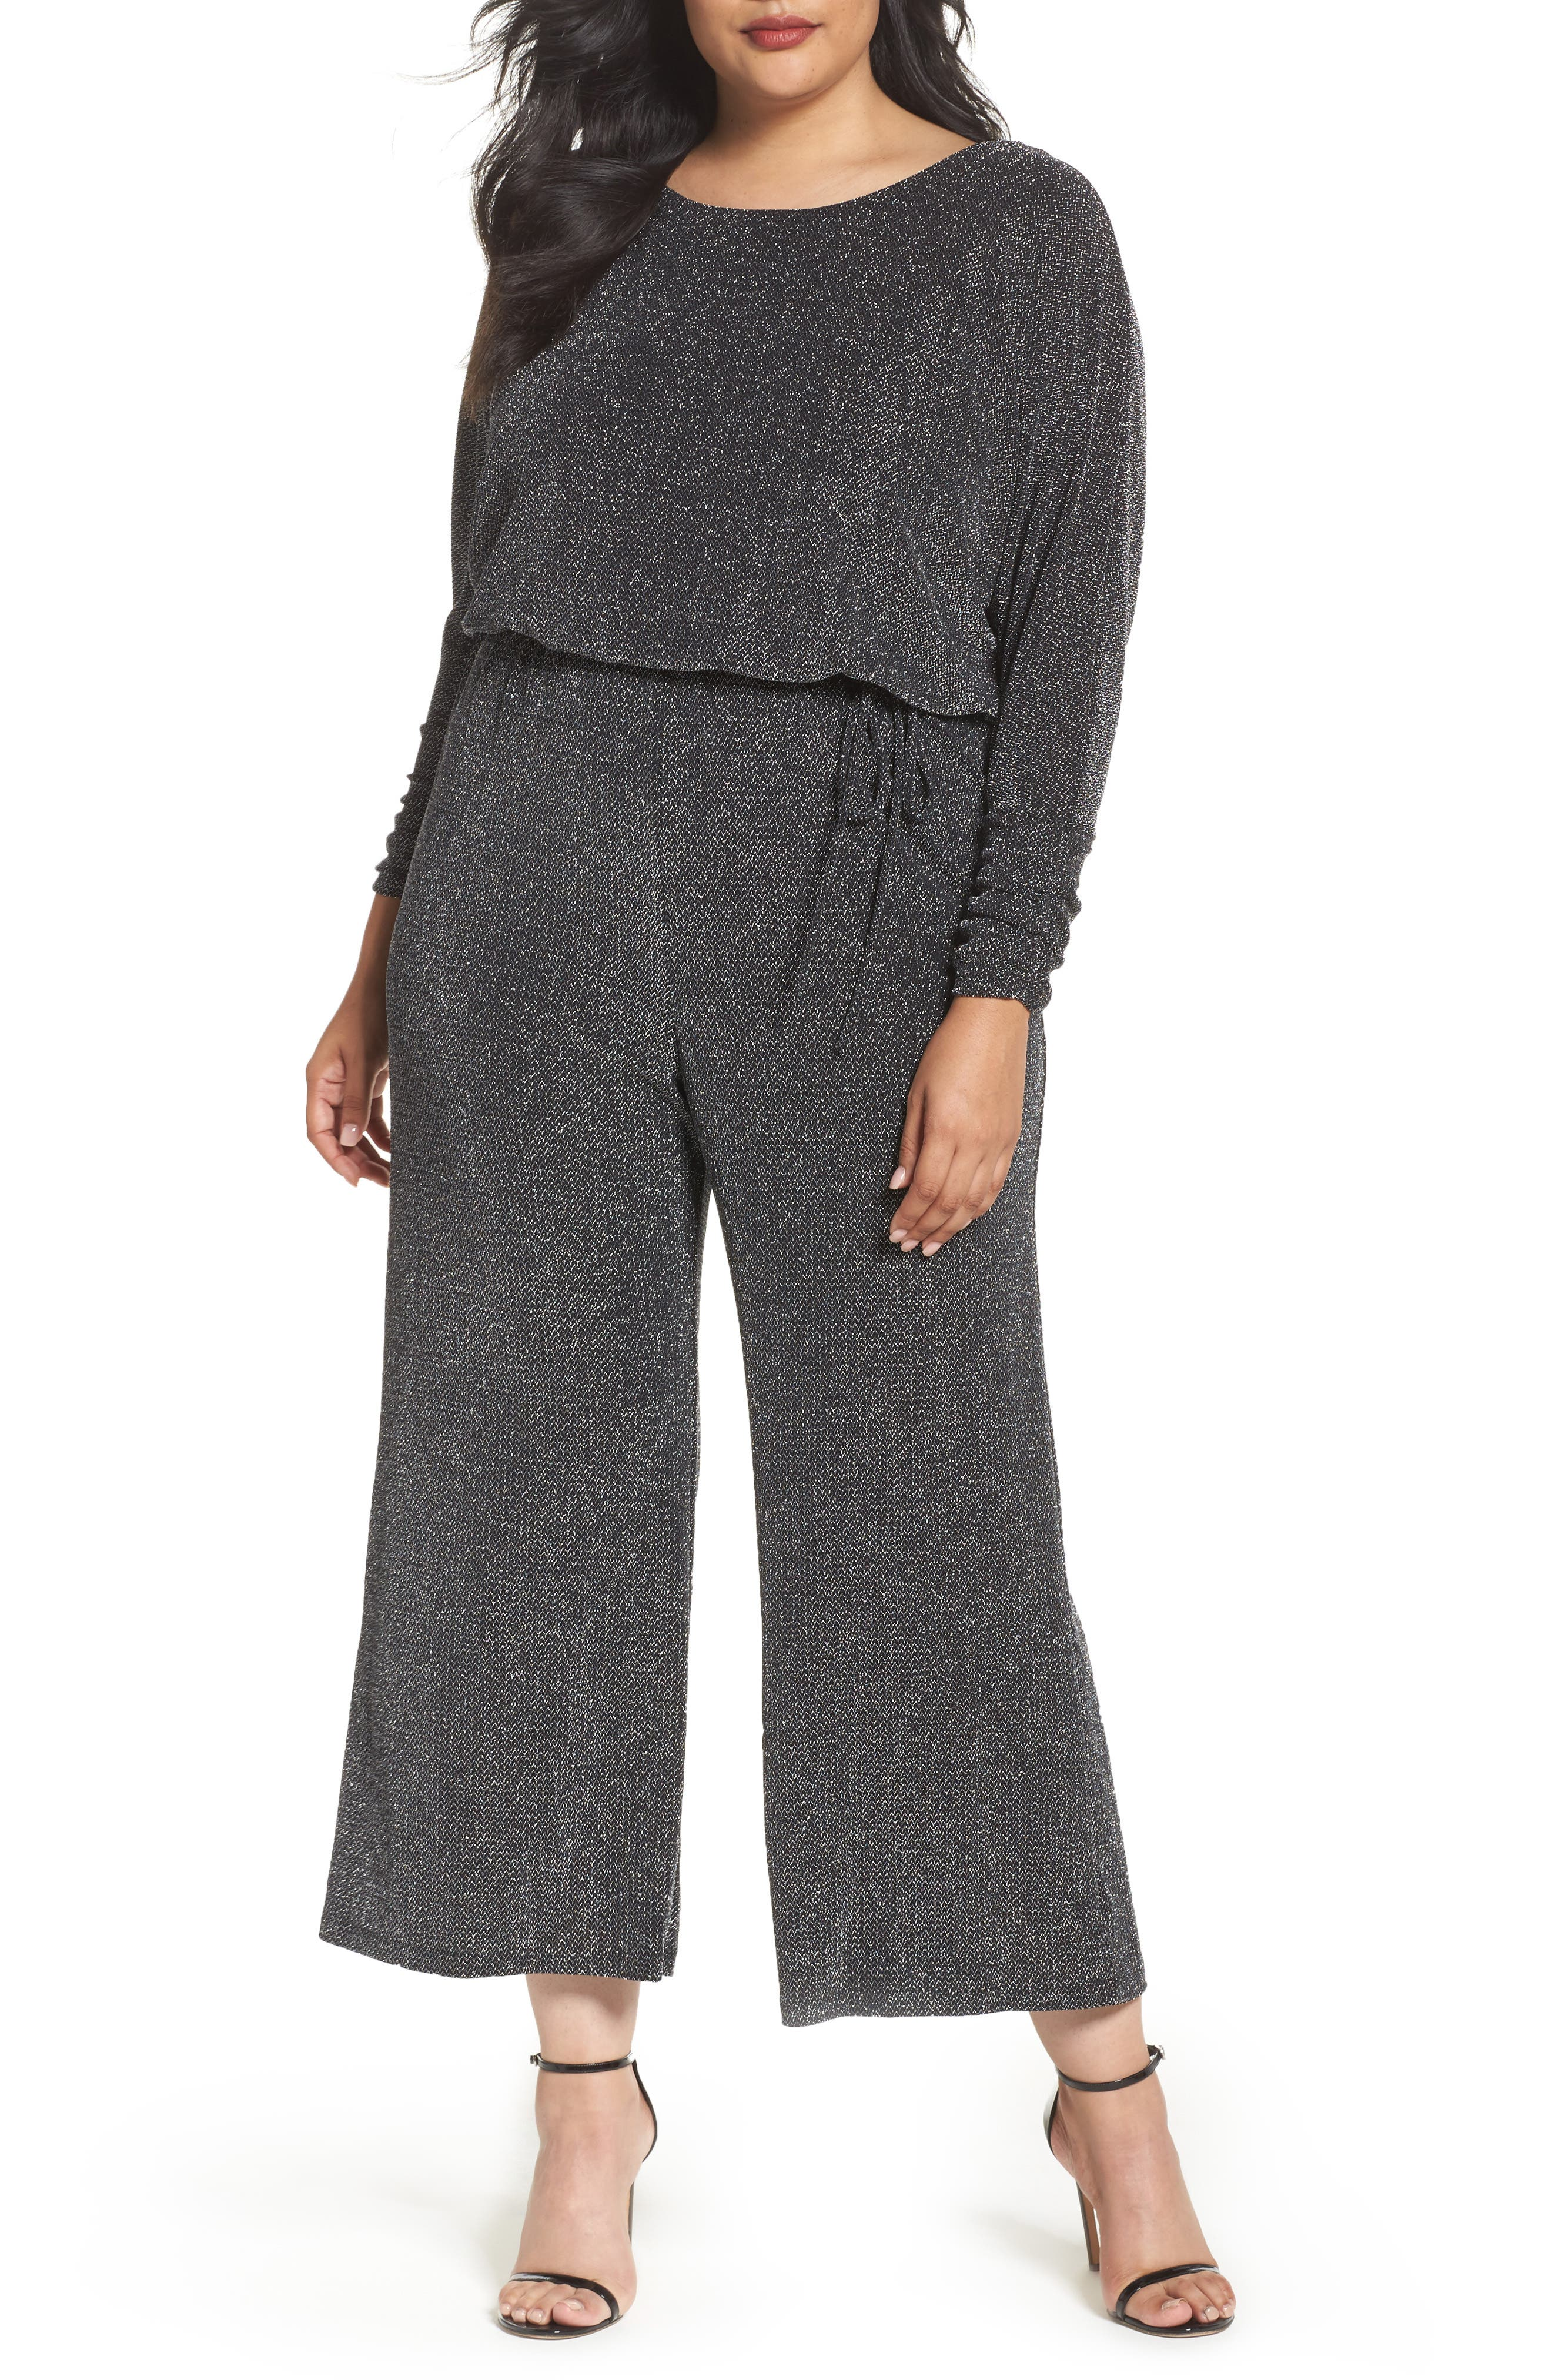 Metallic Knit Jumpsuit,                             Main thumbnail 1, color,                             Black/ Silver